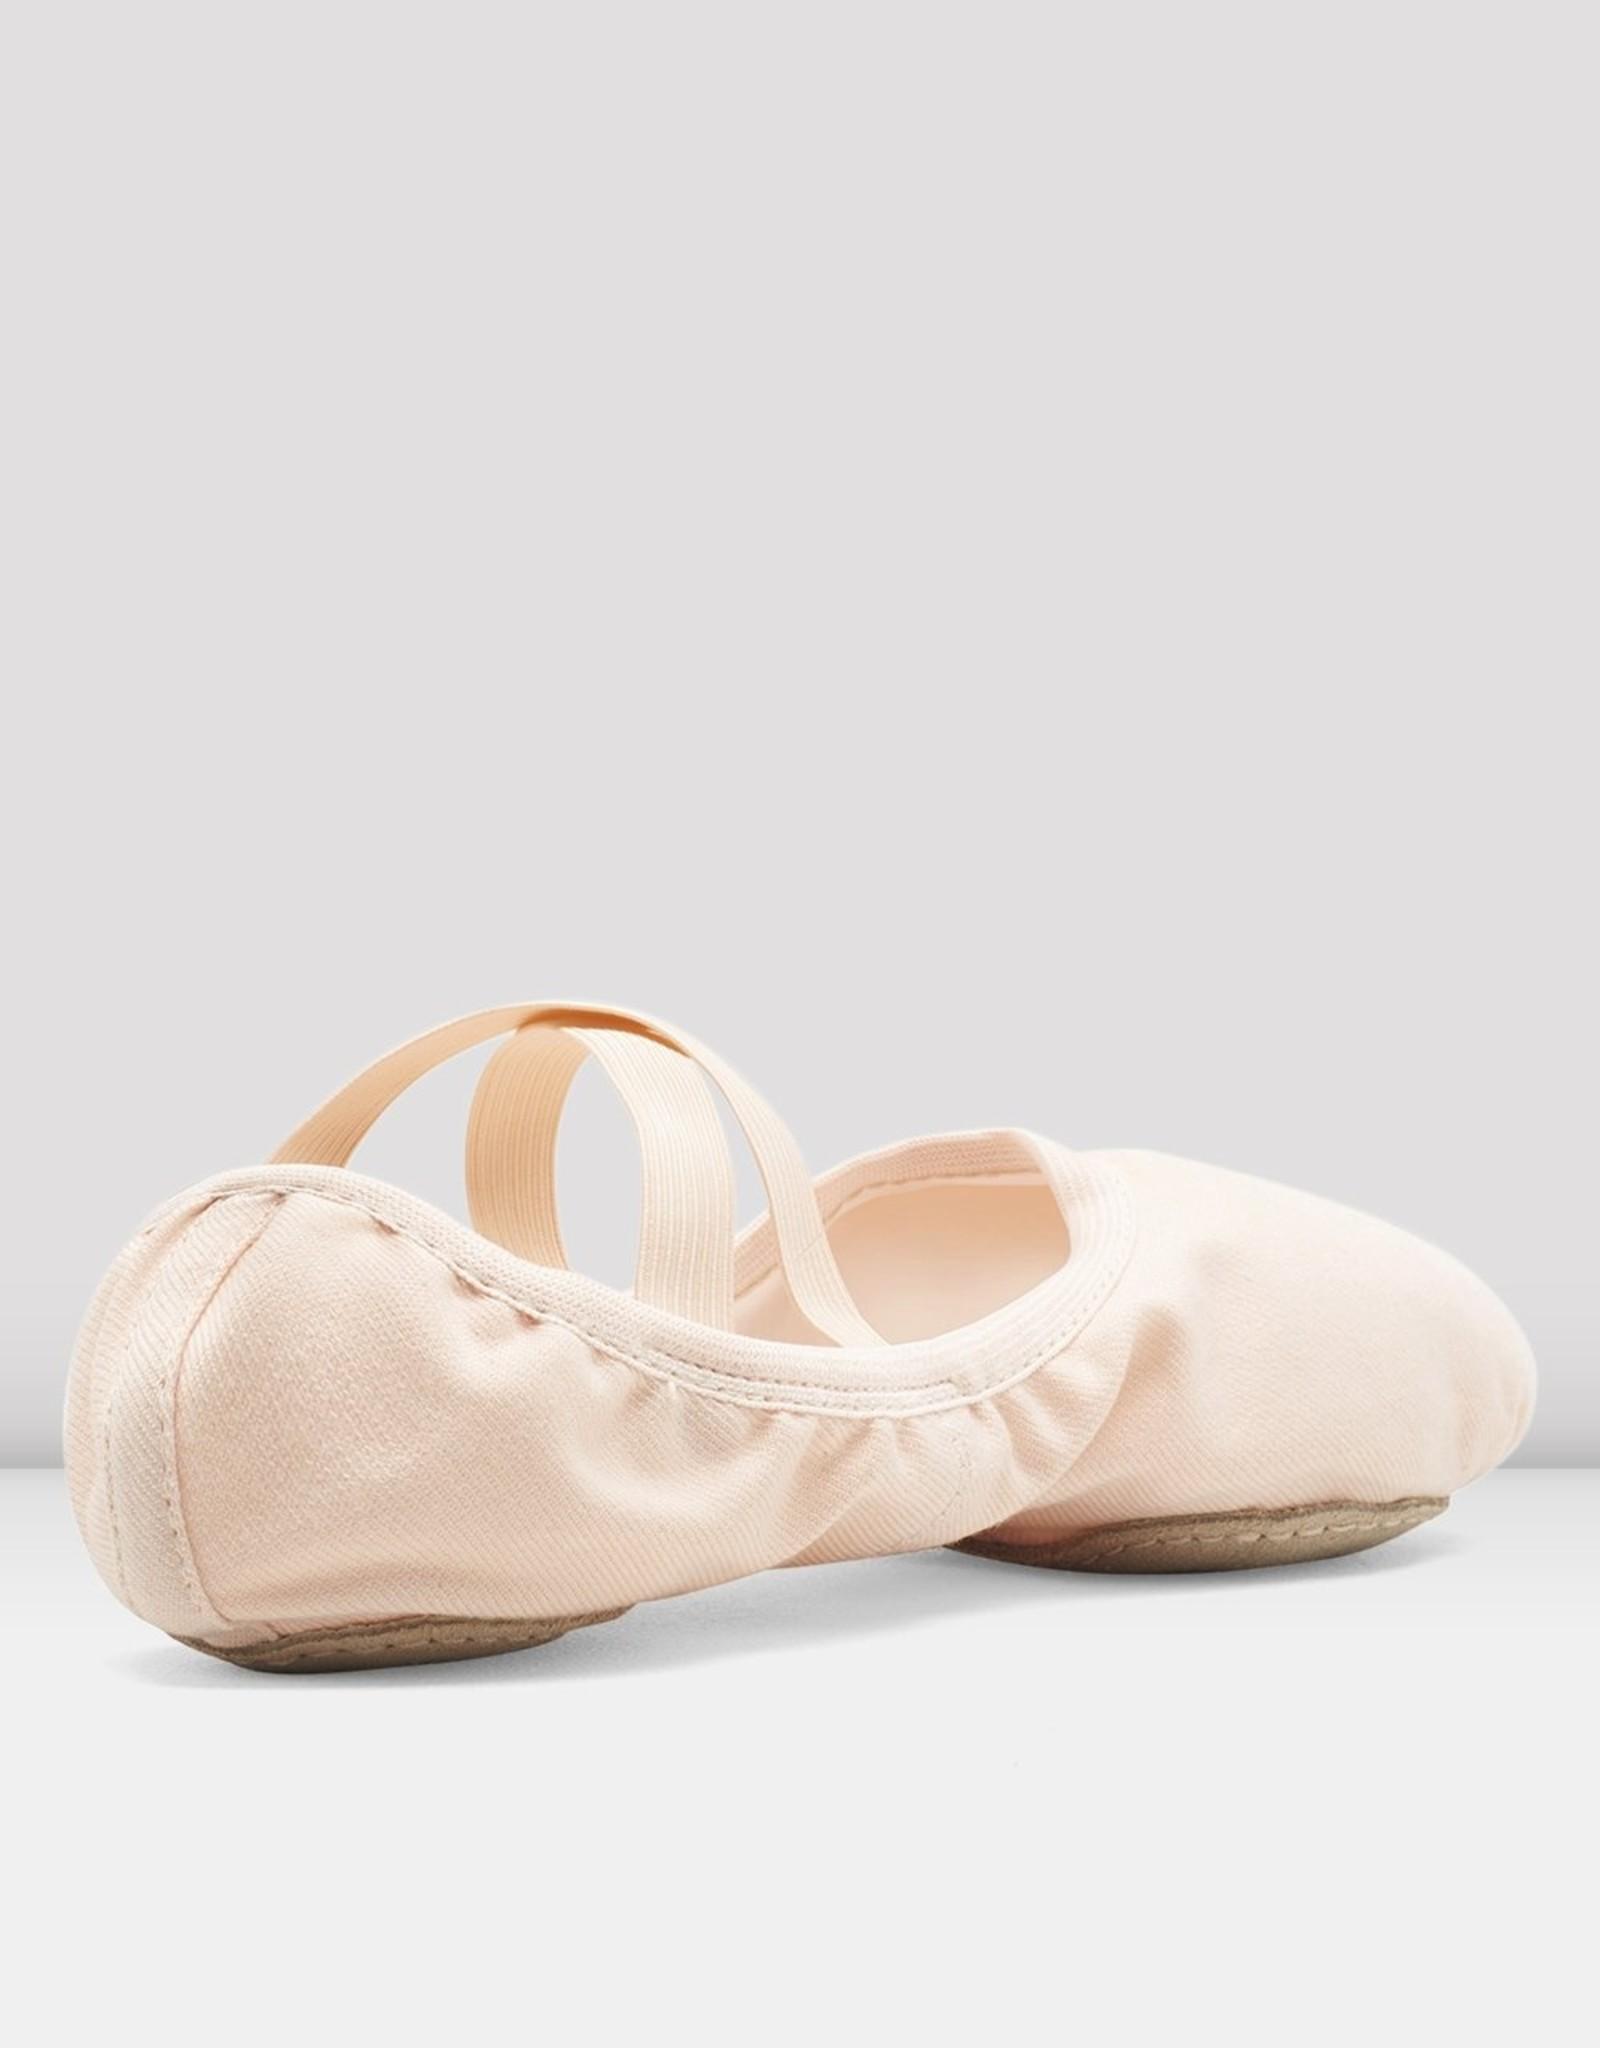 Bloch Bloch Performa Ballet Shoes Girls S0284G